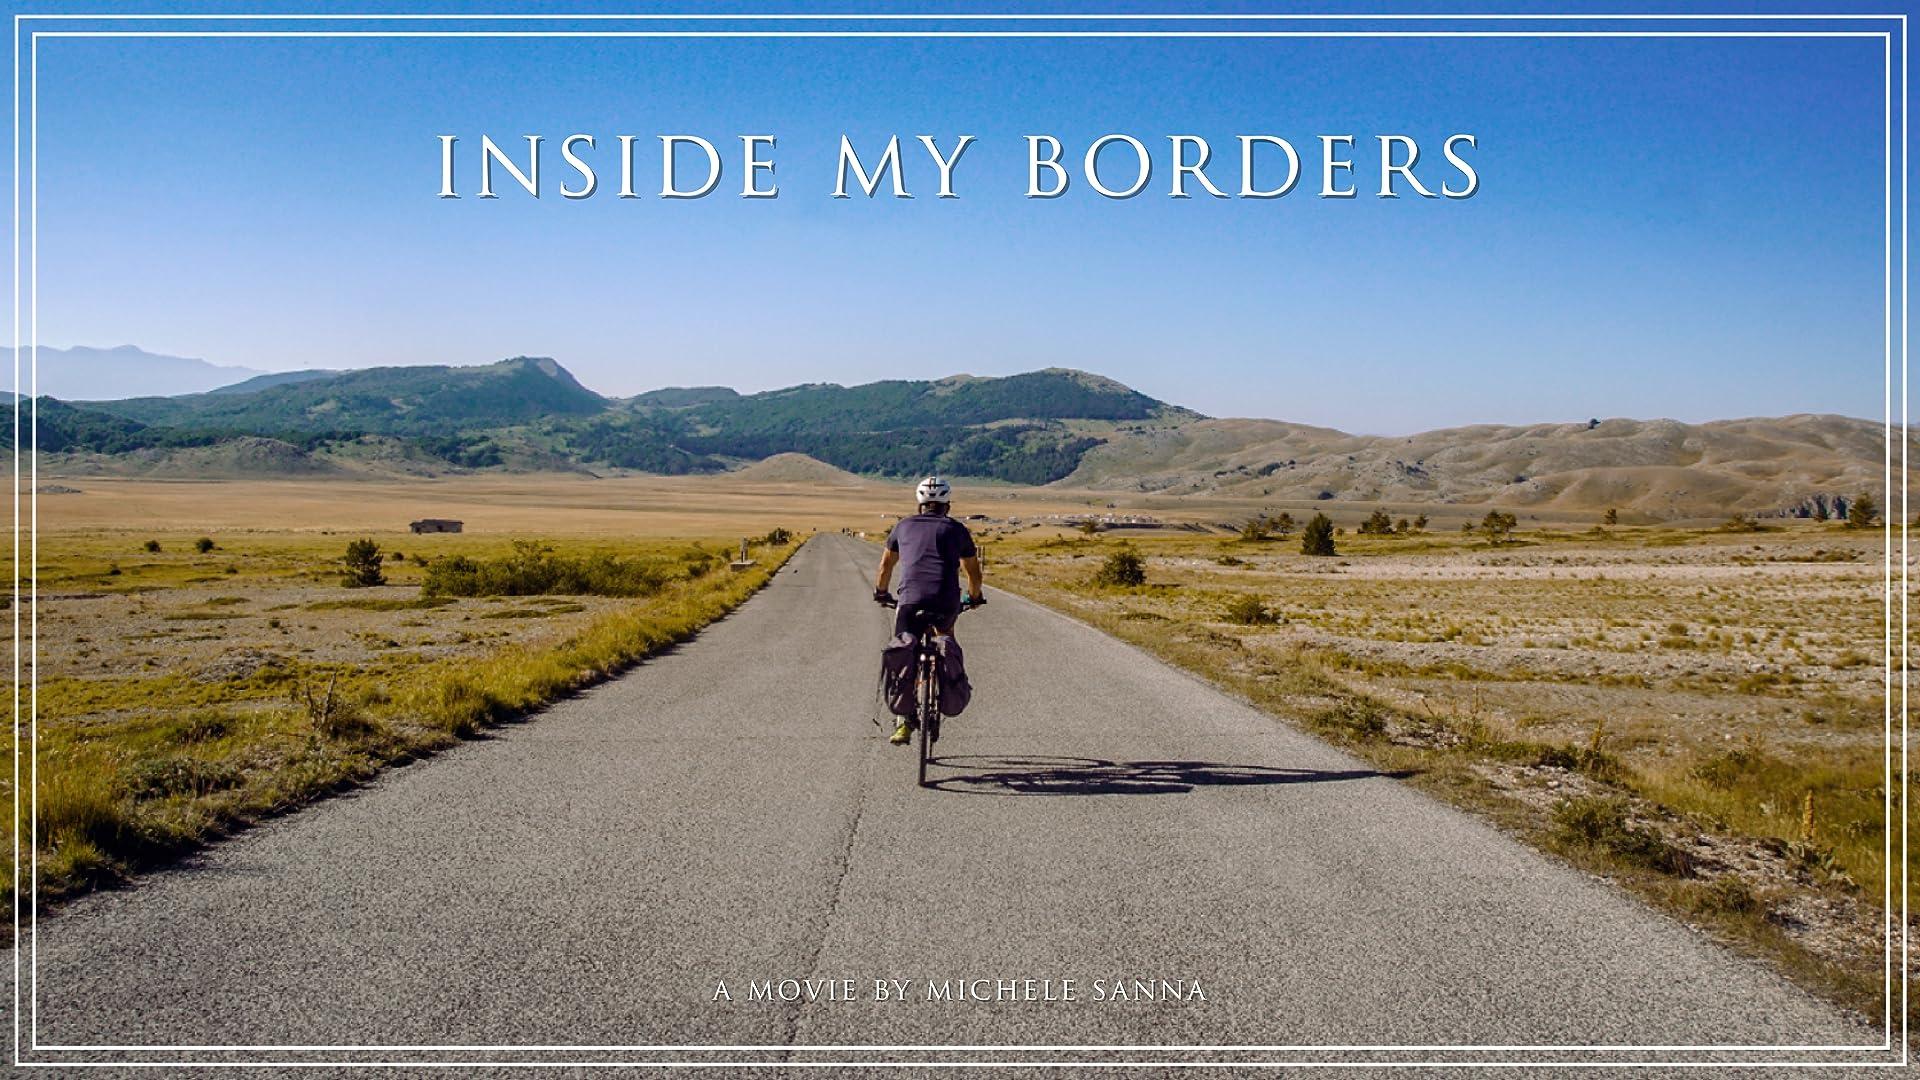 Inside My Borders